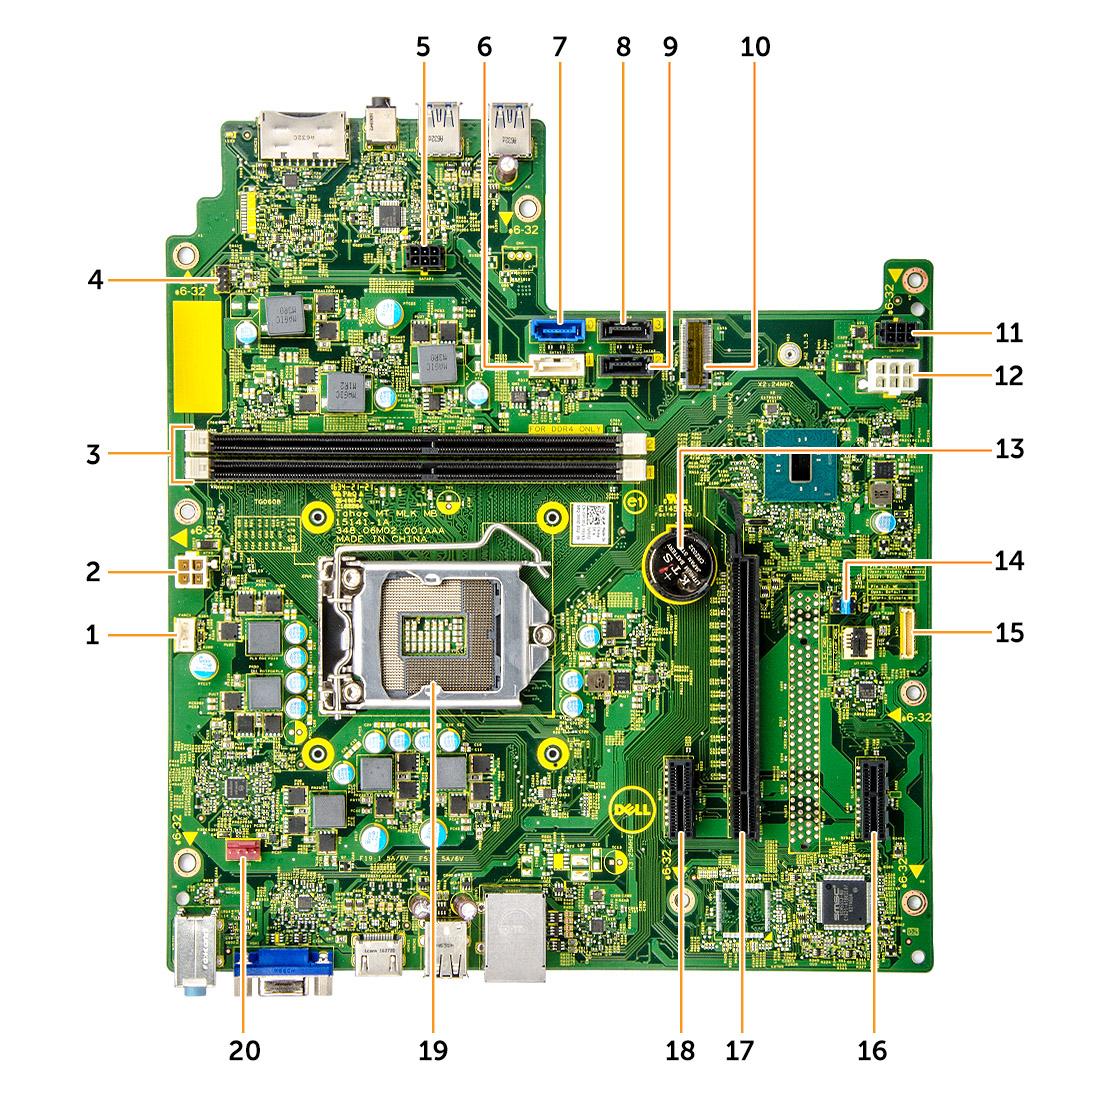 Dell Optiplex Diagram Great Design Of Wiring Kama Ts254 755 Sff Diagrams Schemes Diagnostic Codes Lights 1 3